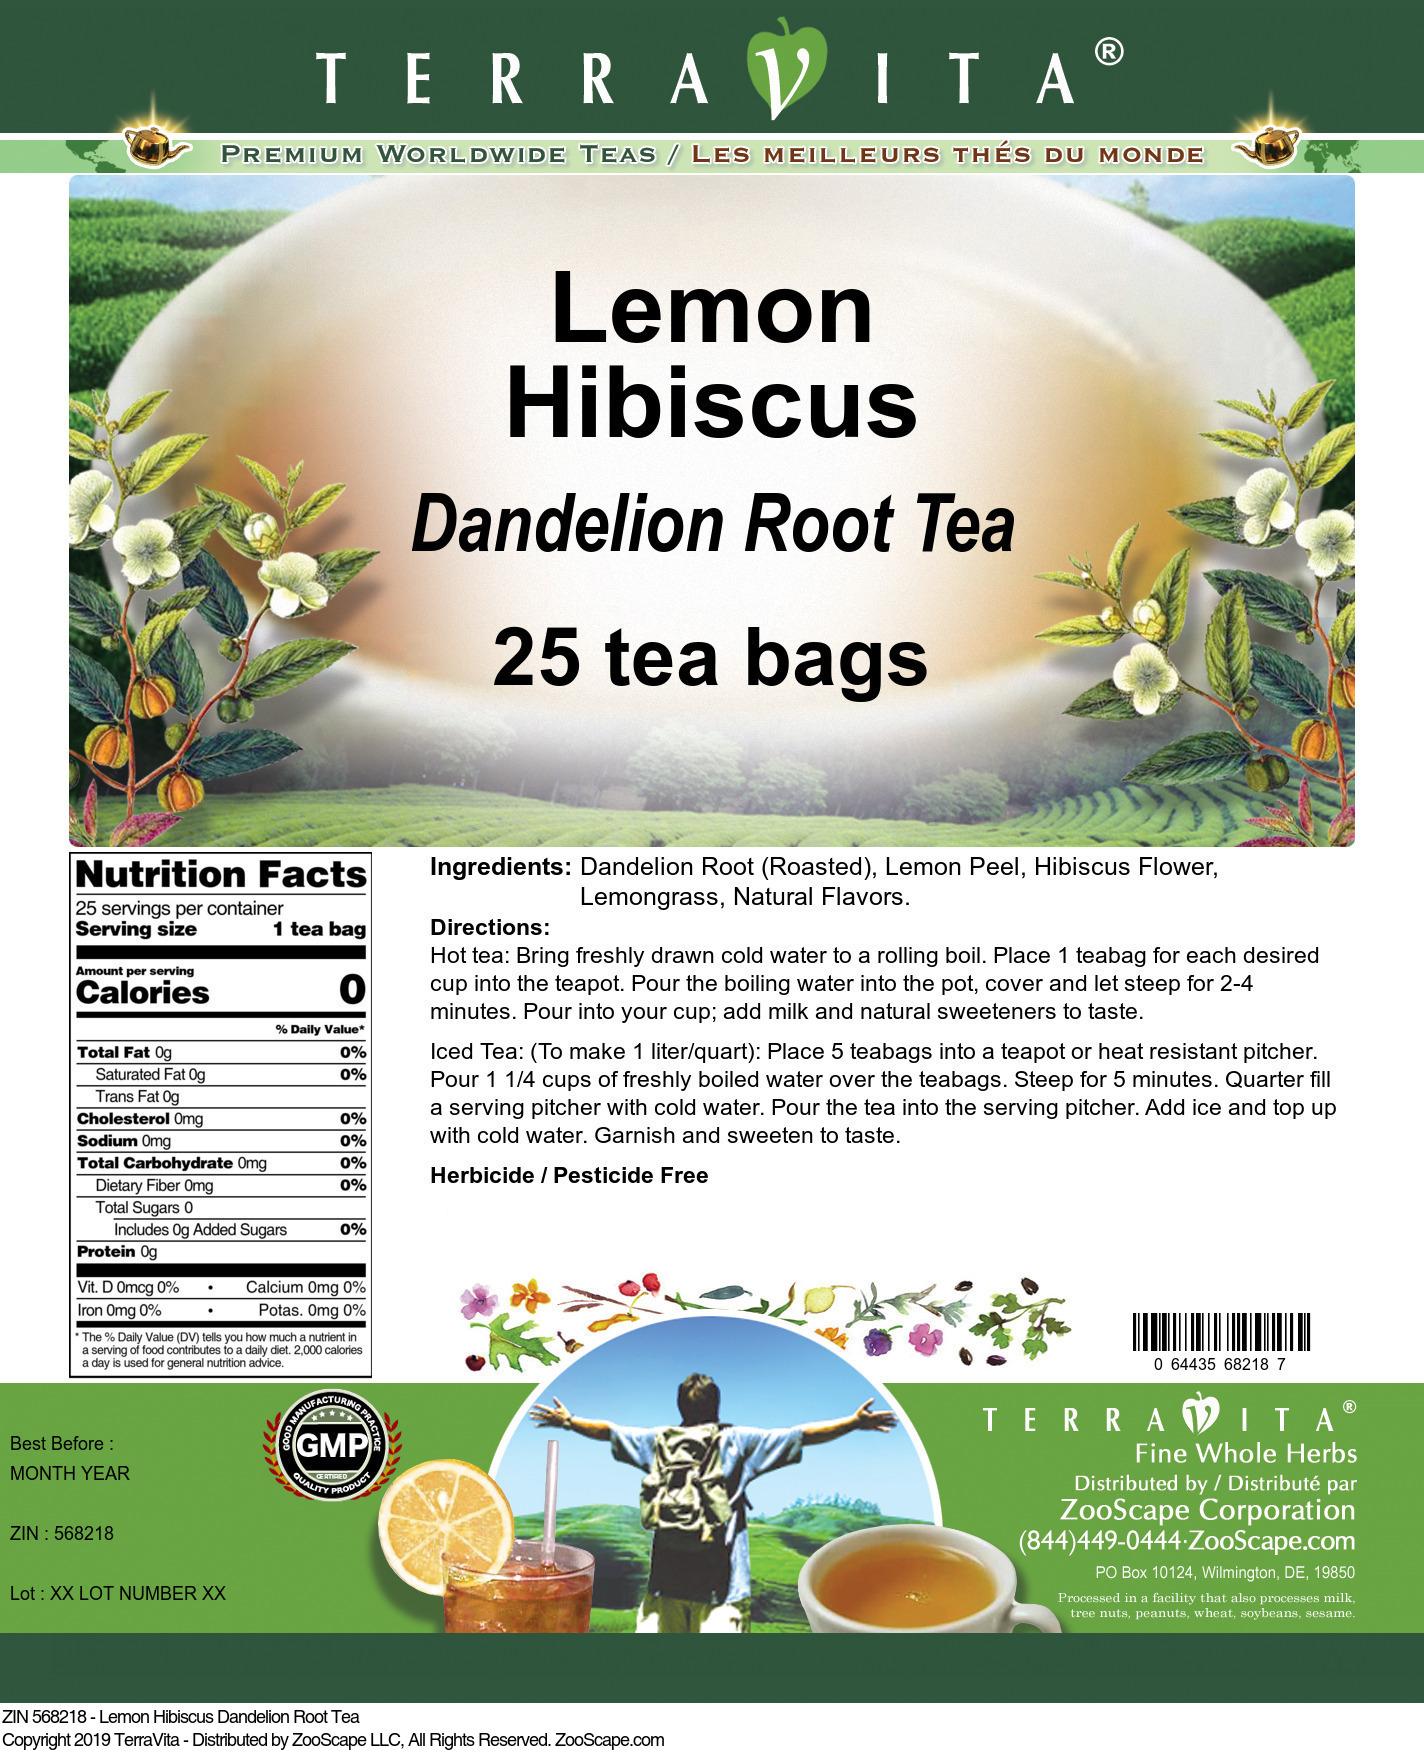 Lemon Hibiscus Dandelion Root